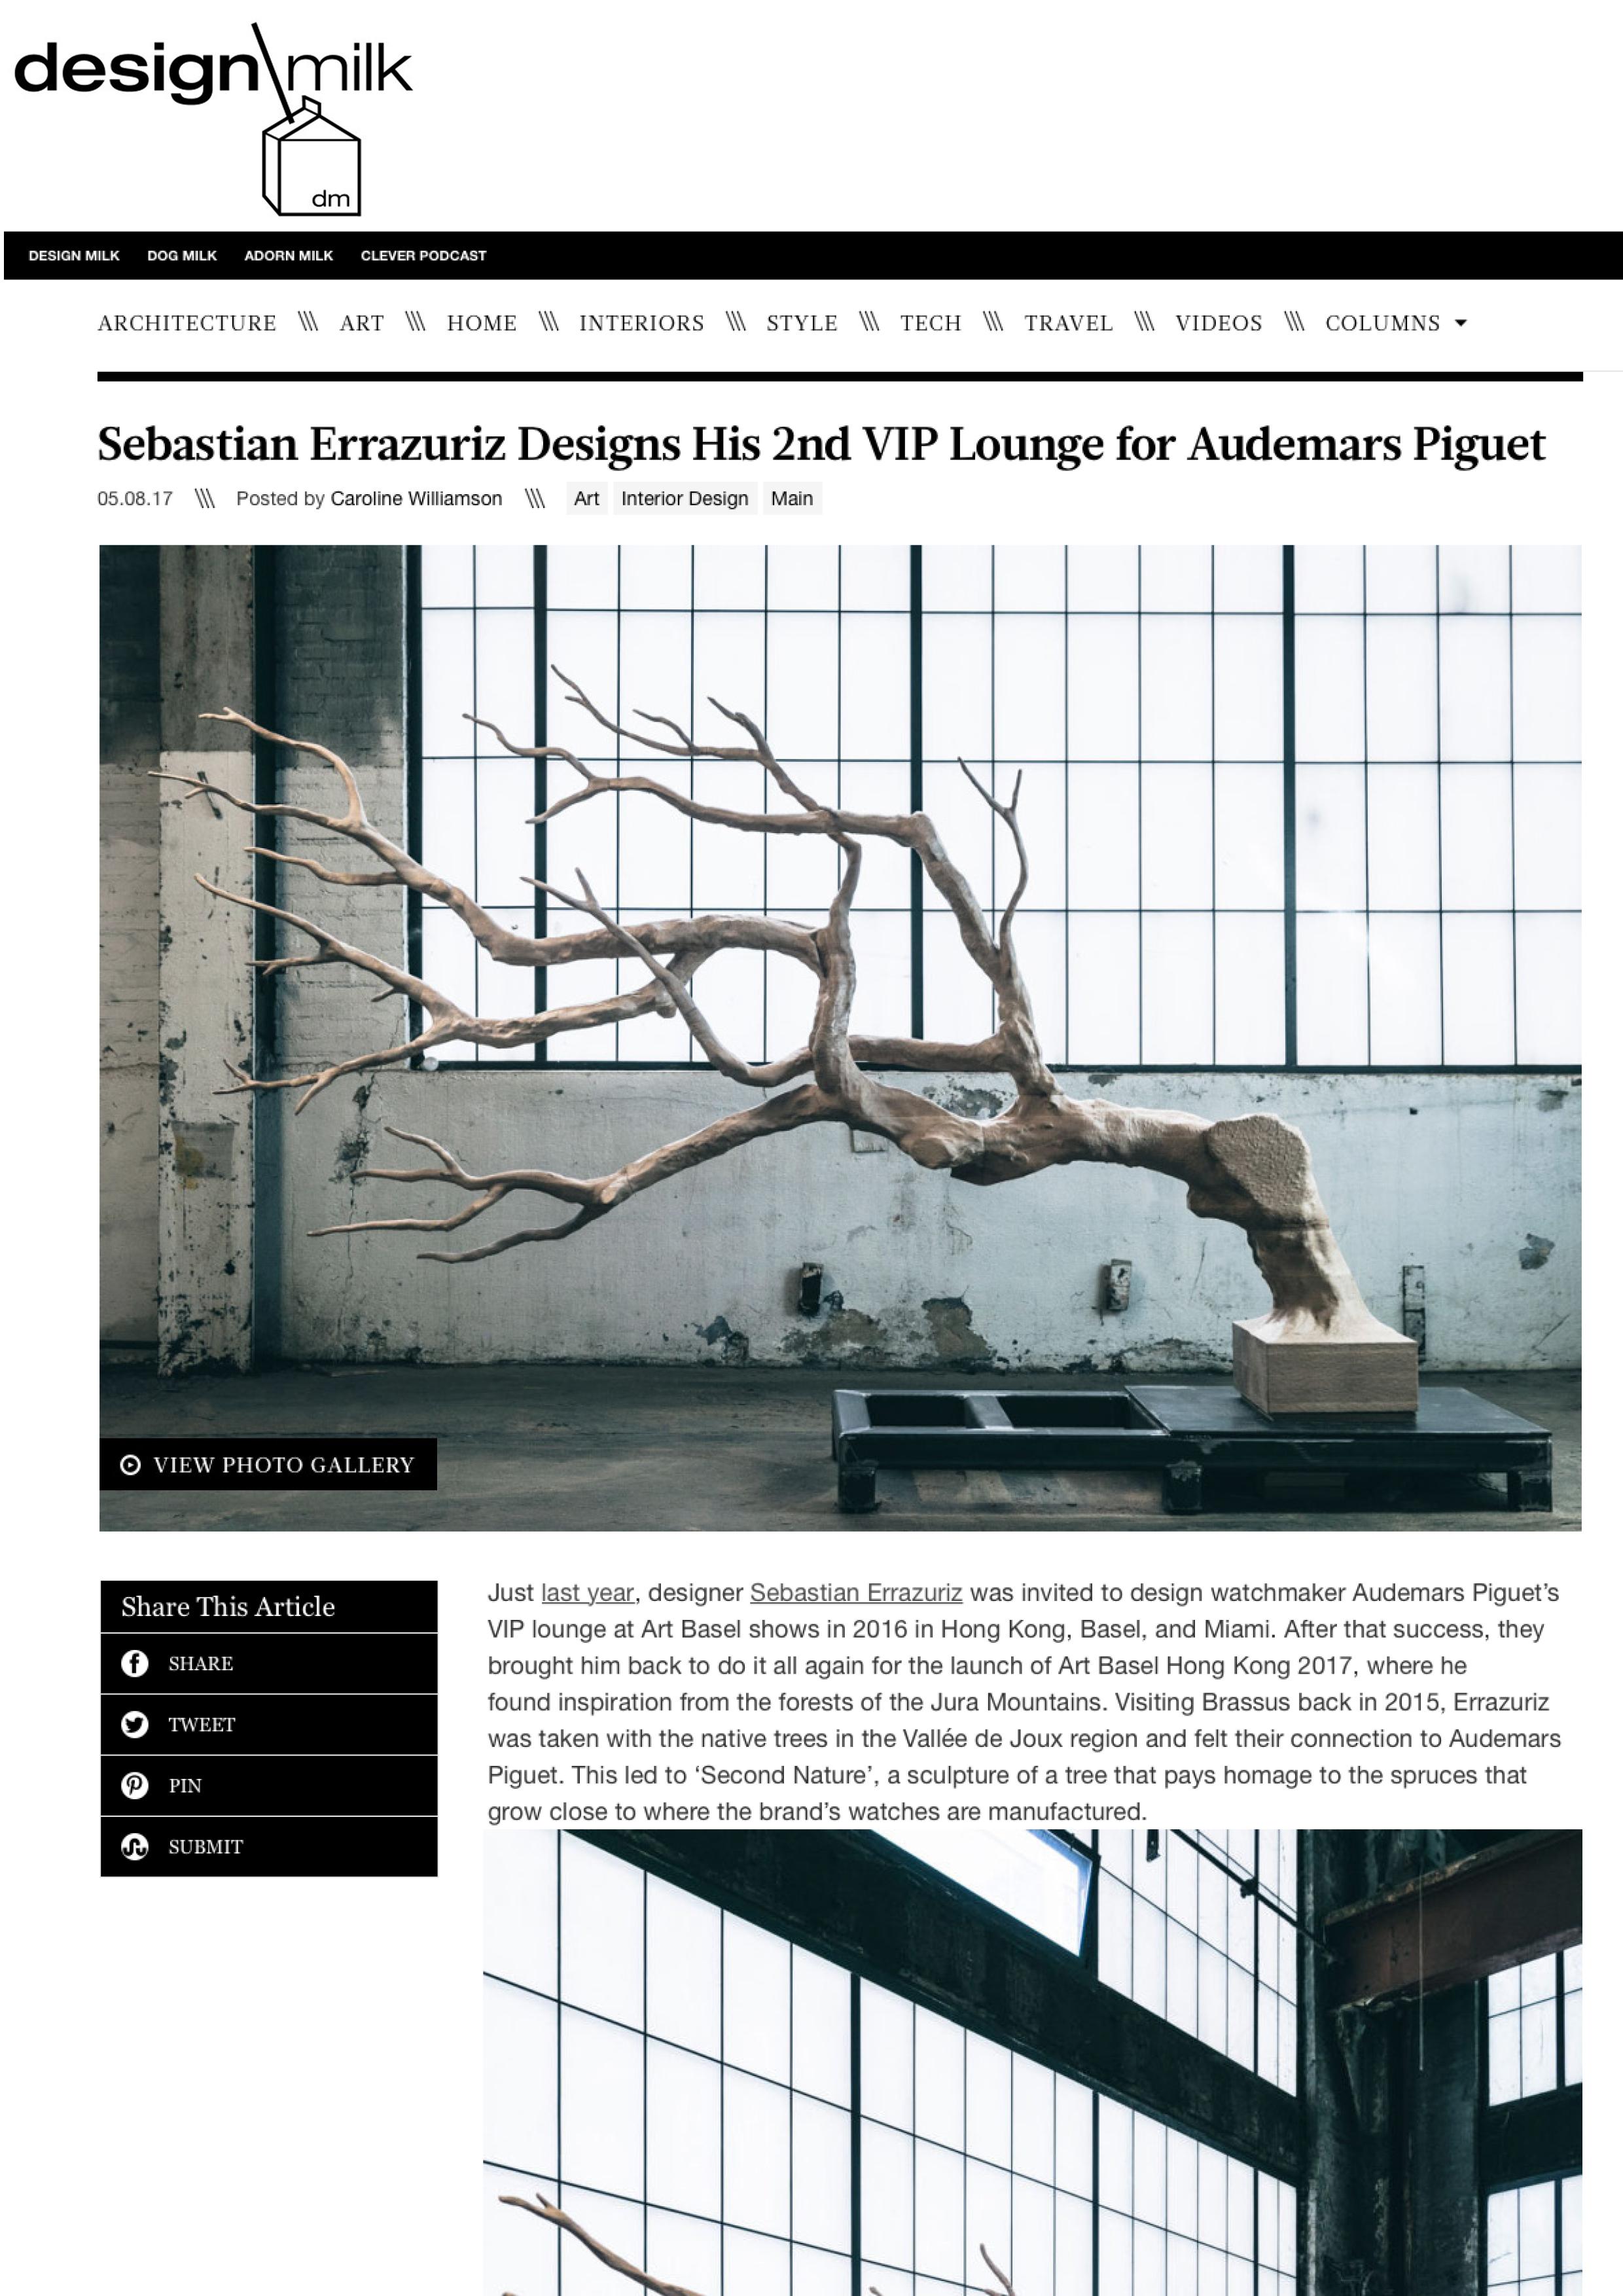 Design_Milk_may_08_2017-1.jpg